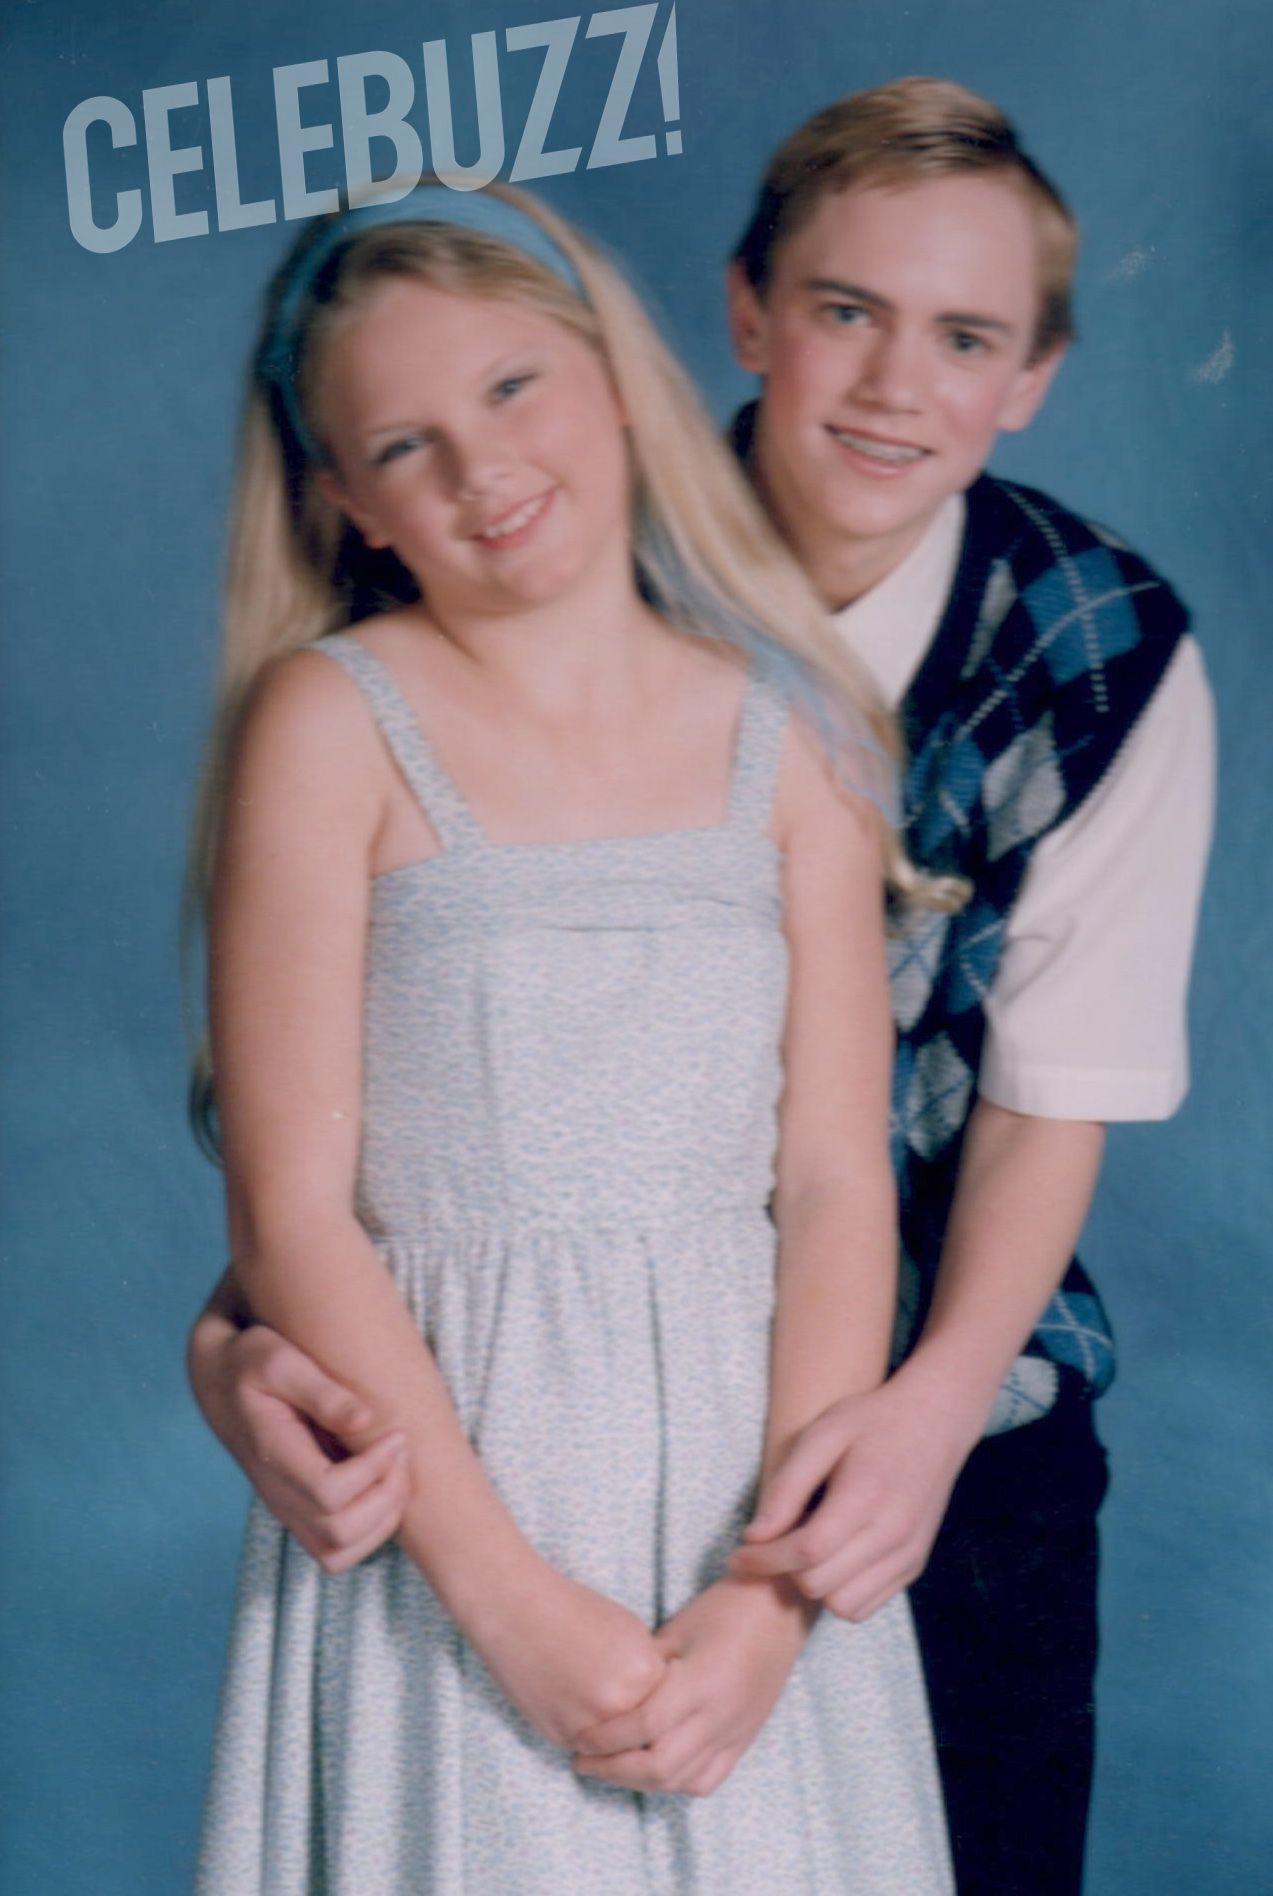 Omg Awkward Middle School Taylor Taylor Swift Childhood Young Taylor Swift Taylor Swift Pictures